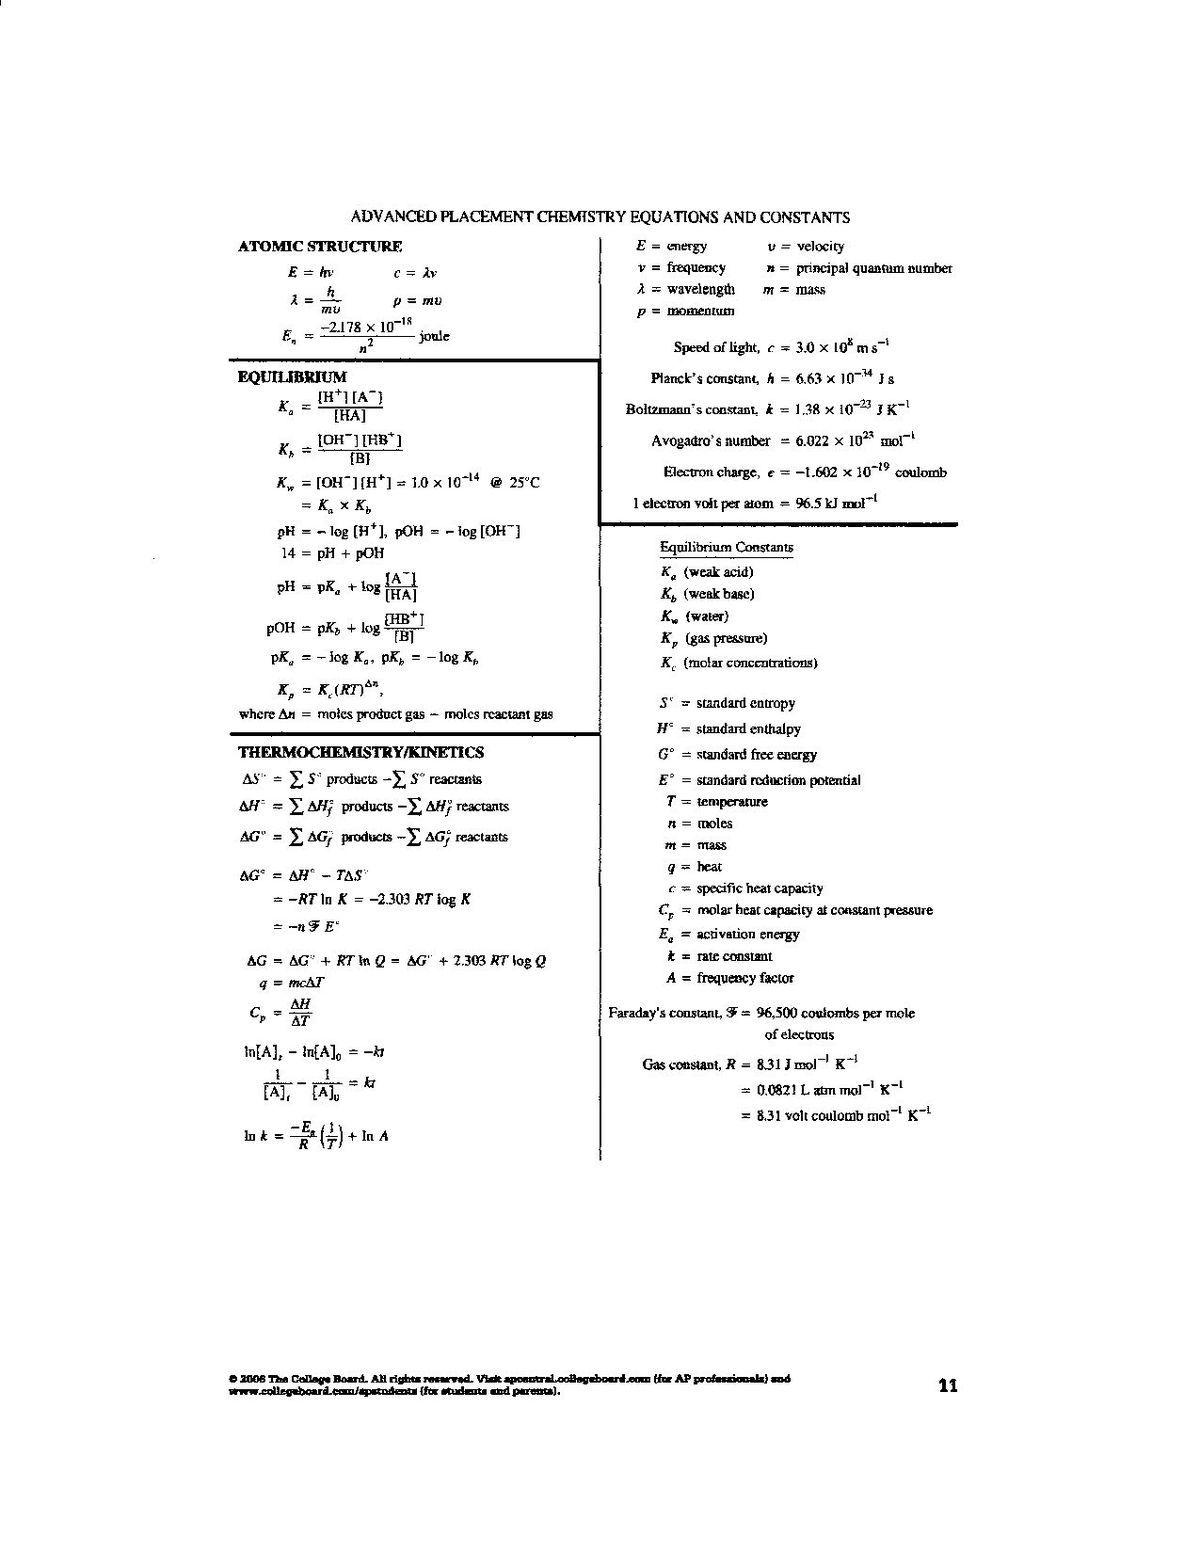 Ec09723c87e5e9c4c63b5214bc58d997 Jpg 1 200 1 552 Pixels Teaching Chemistry Chemistry Education Science Teaching Resources